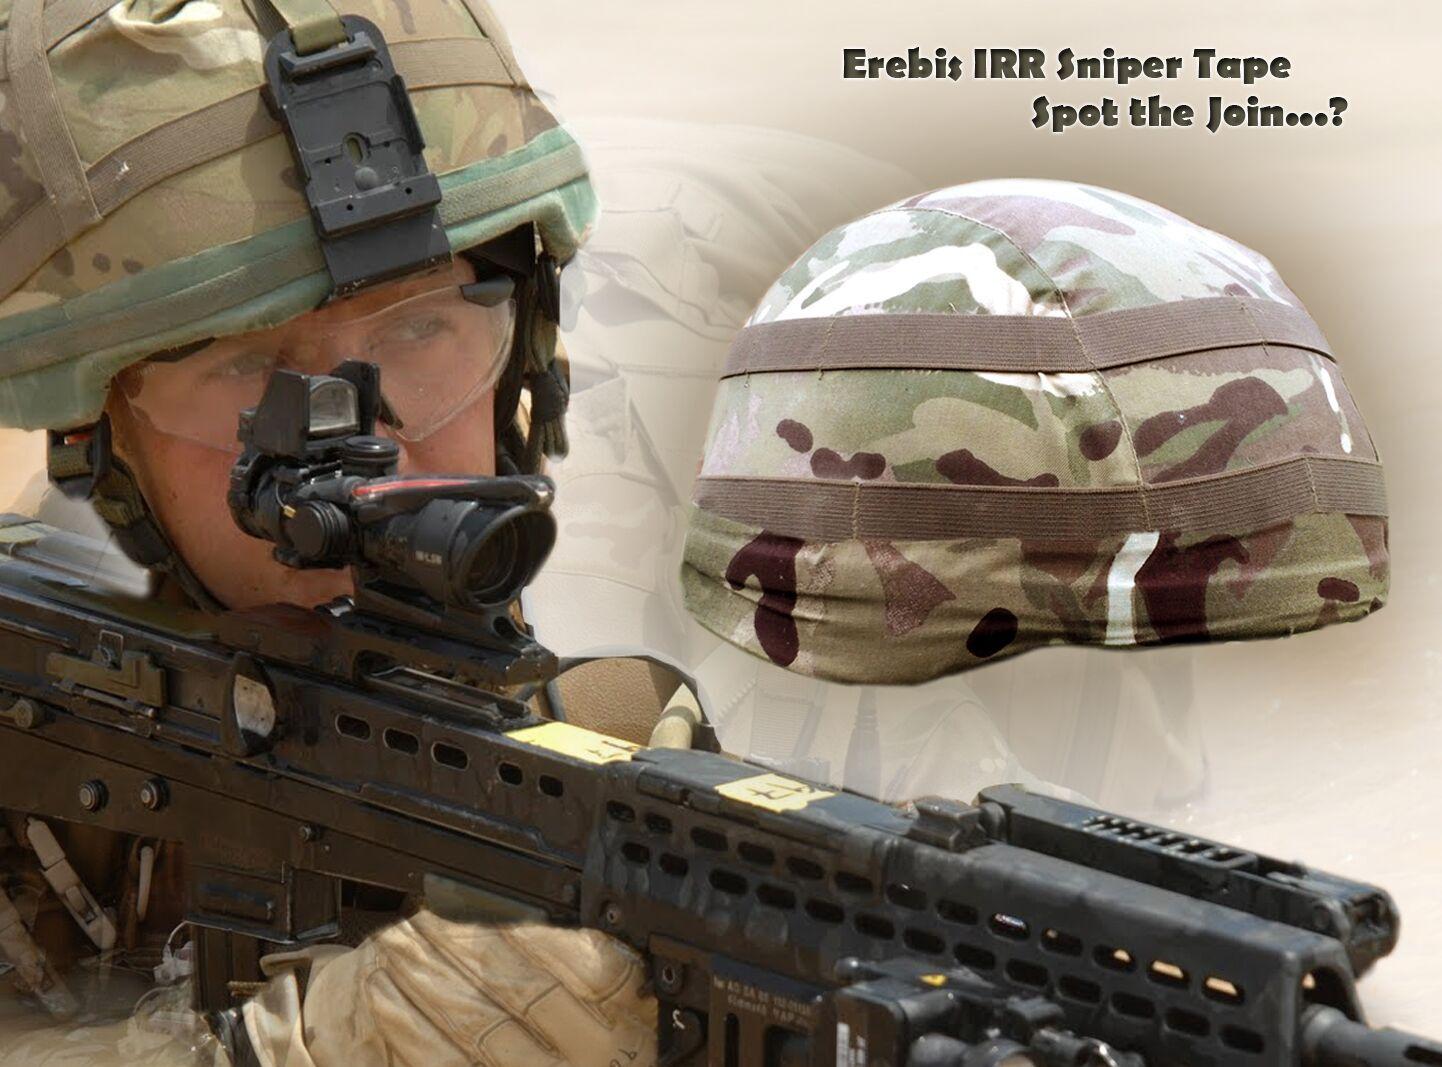 sniper tape2.jpg